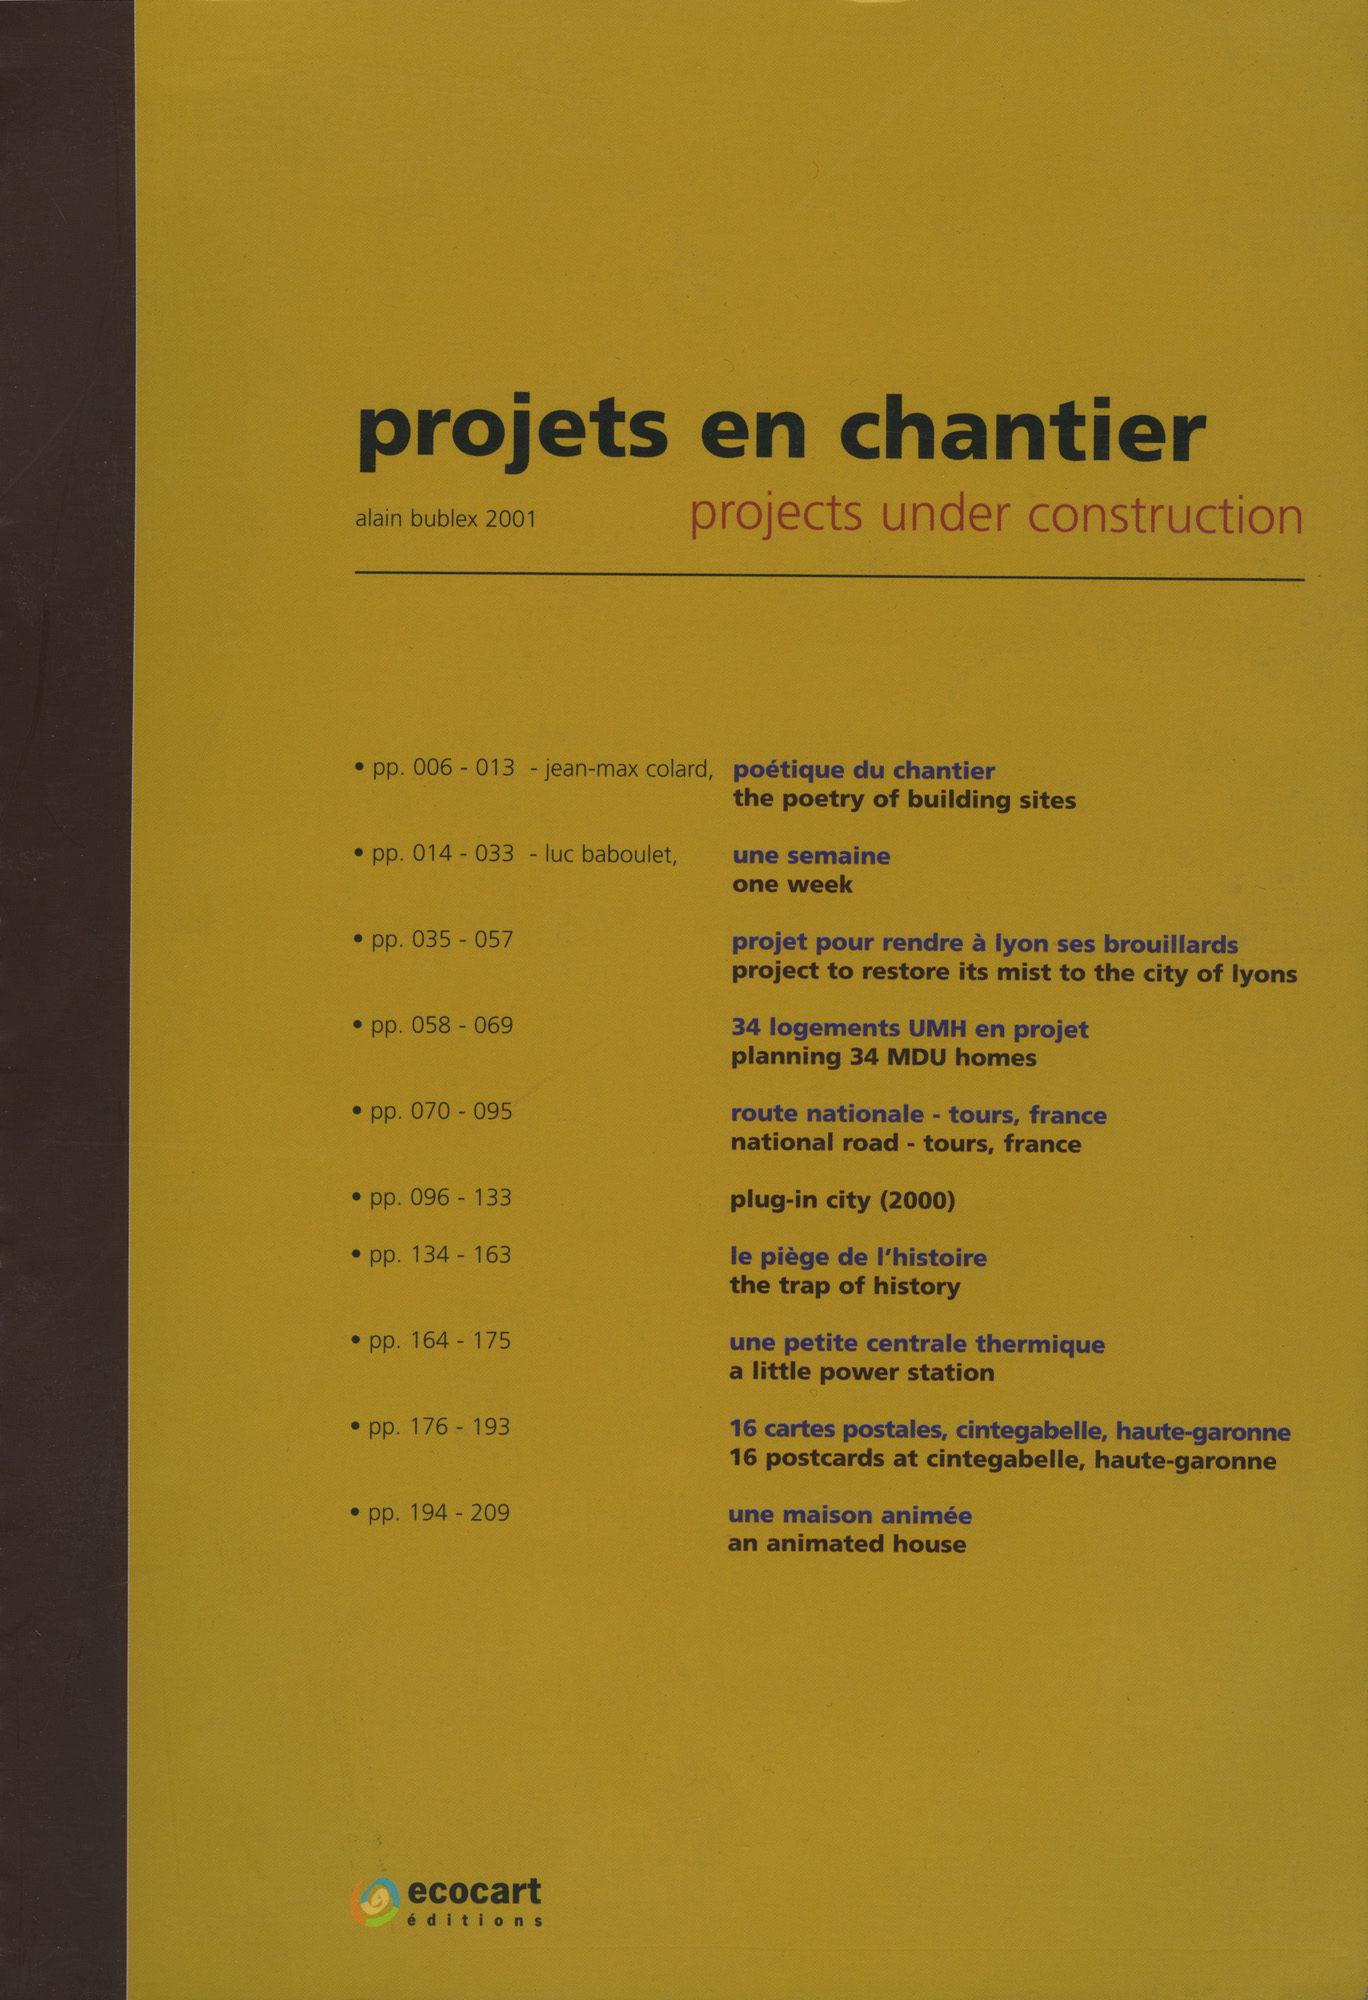 Projets en chantier - Galerie Georges-Philippe & Nathalie Vallois